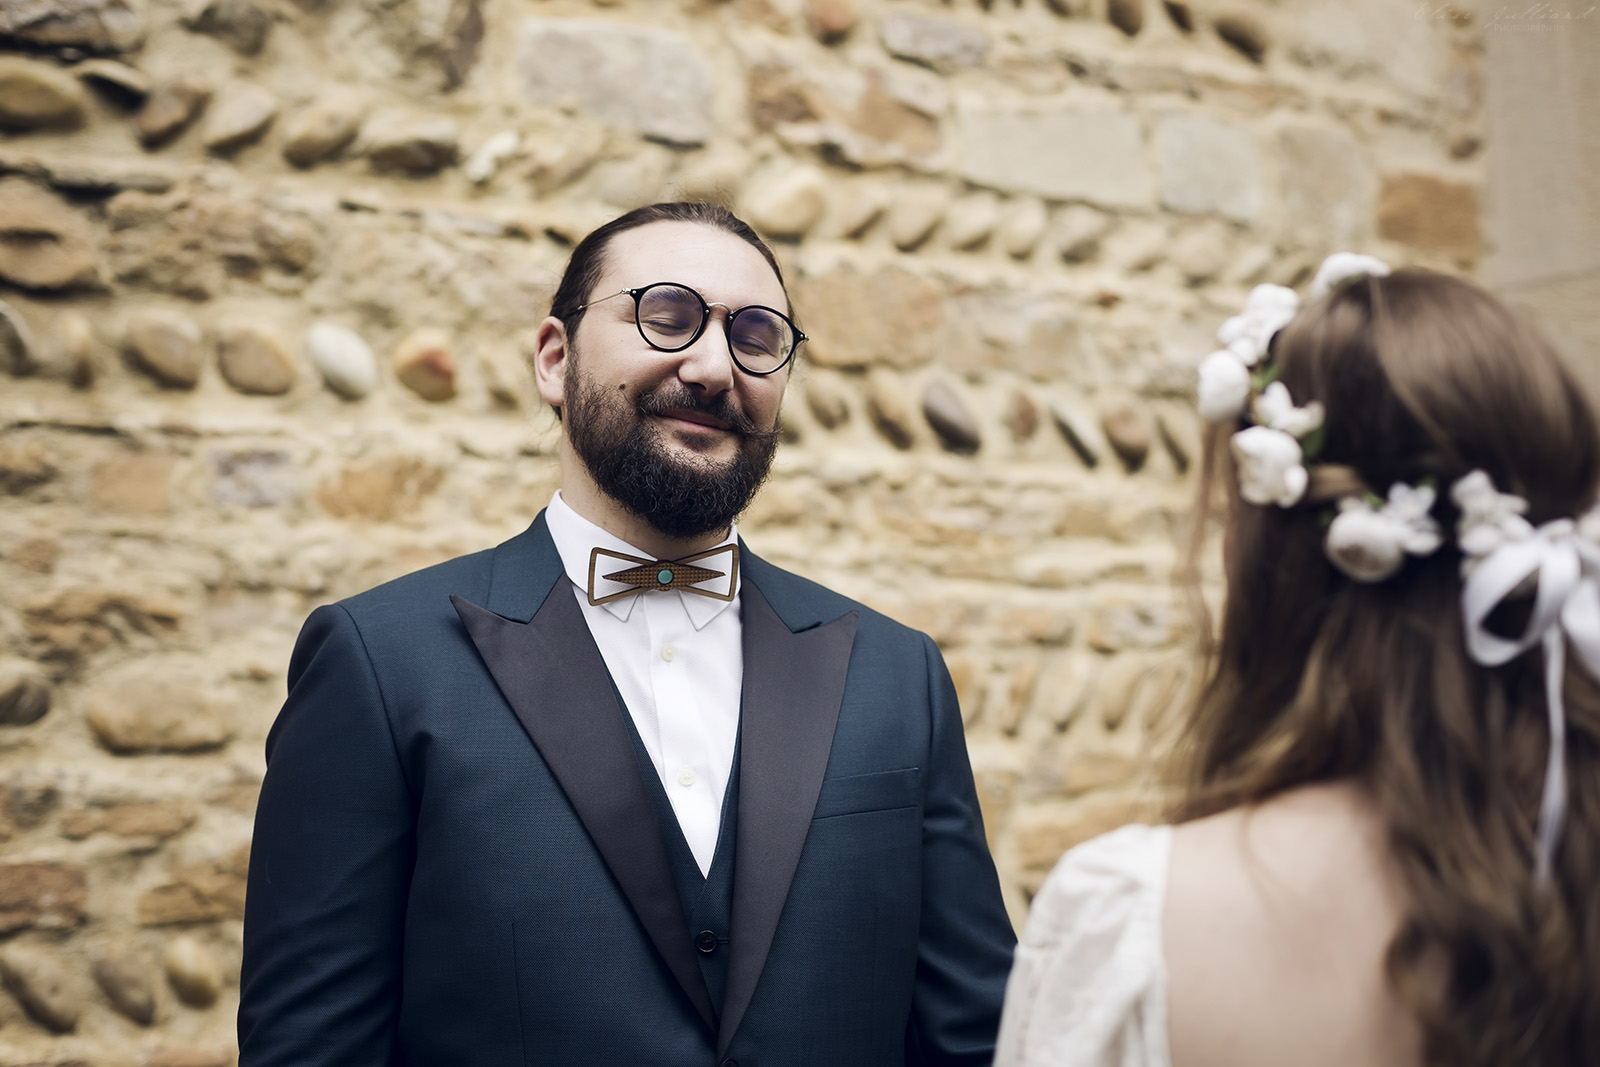 mariage-wedding-photographe-photographer-reportage-seance-photo-couple-amoureux-amour-famille-domaine-du-petit-chambard-auvergne-rhone-alpes-ain-lyon-bourg-en-bresse-elise-julliard